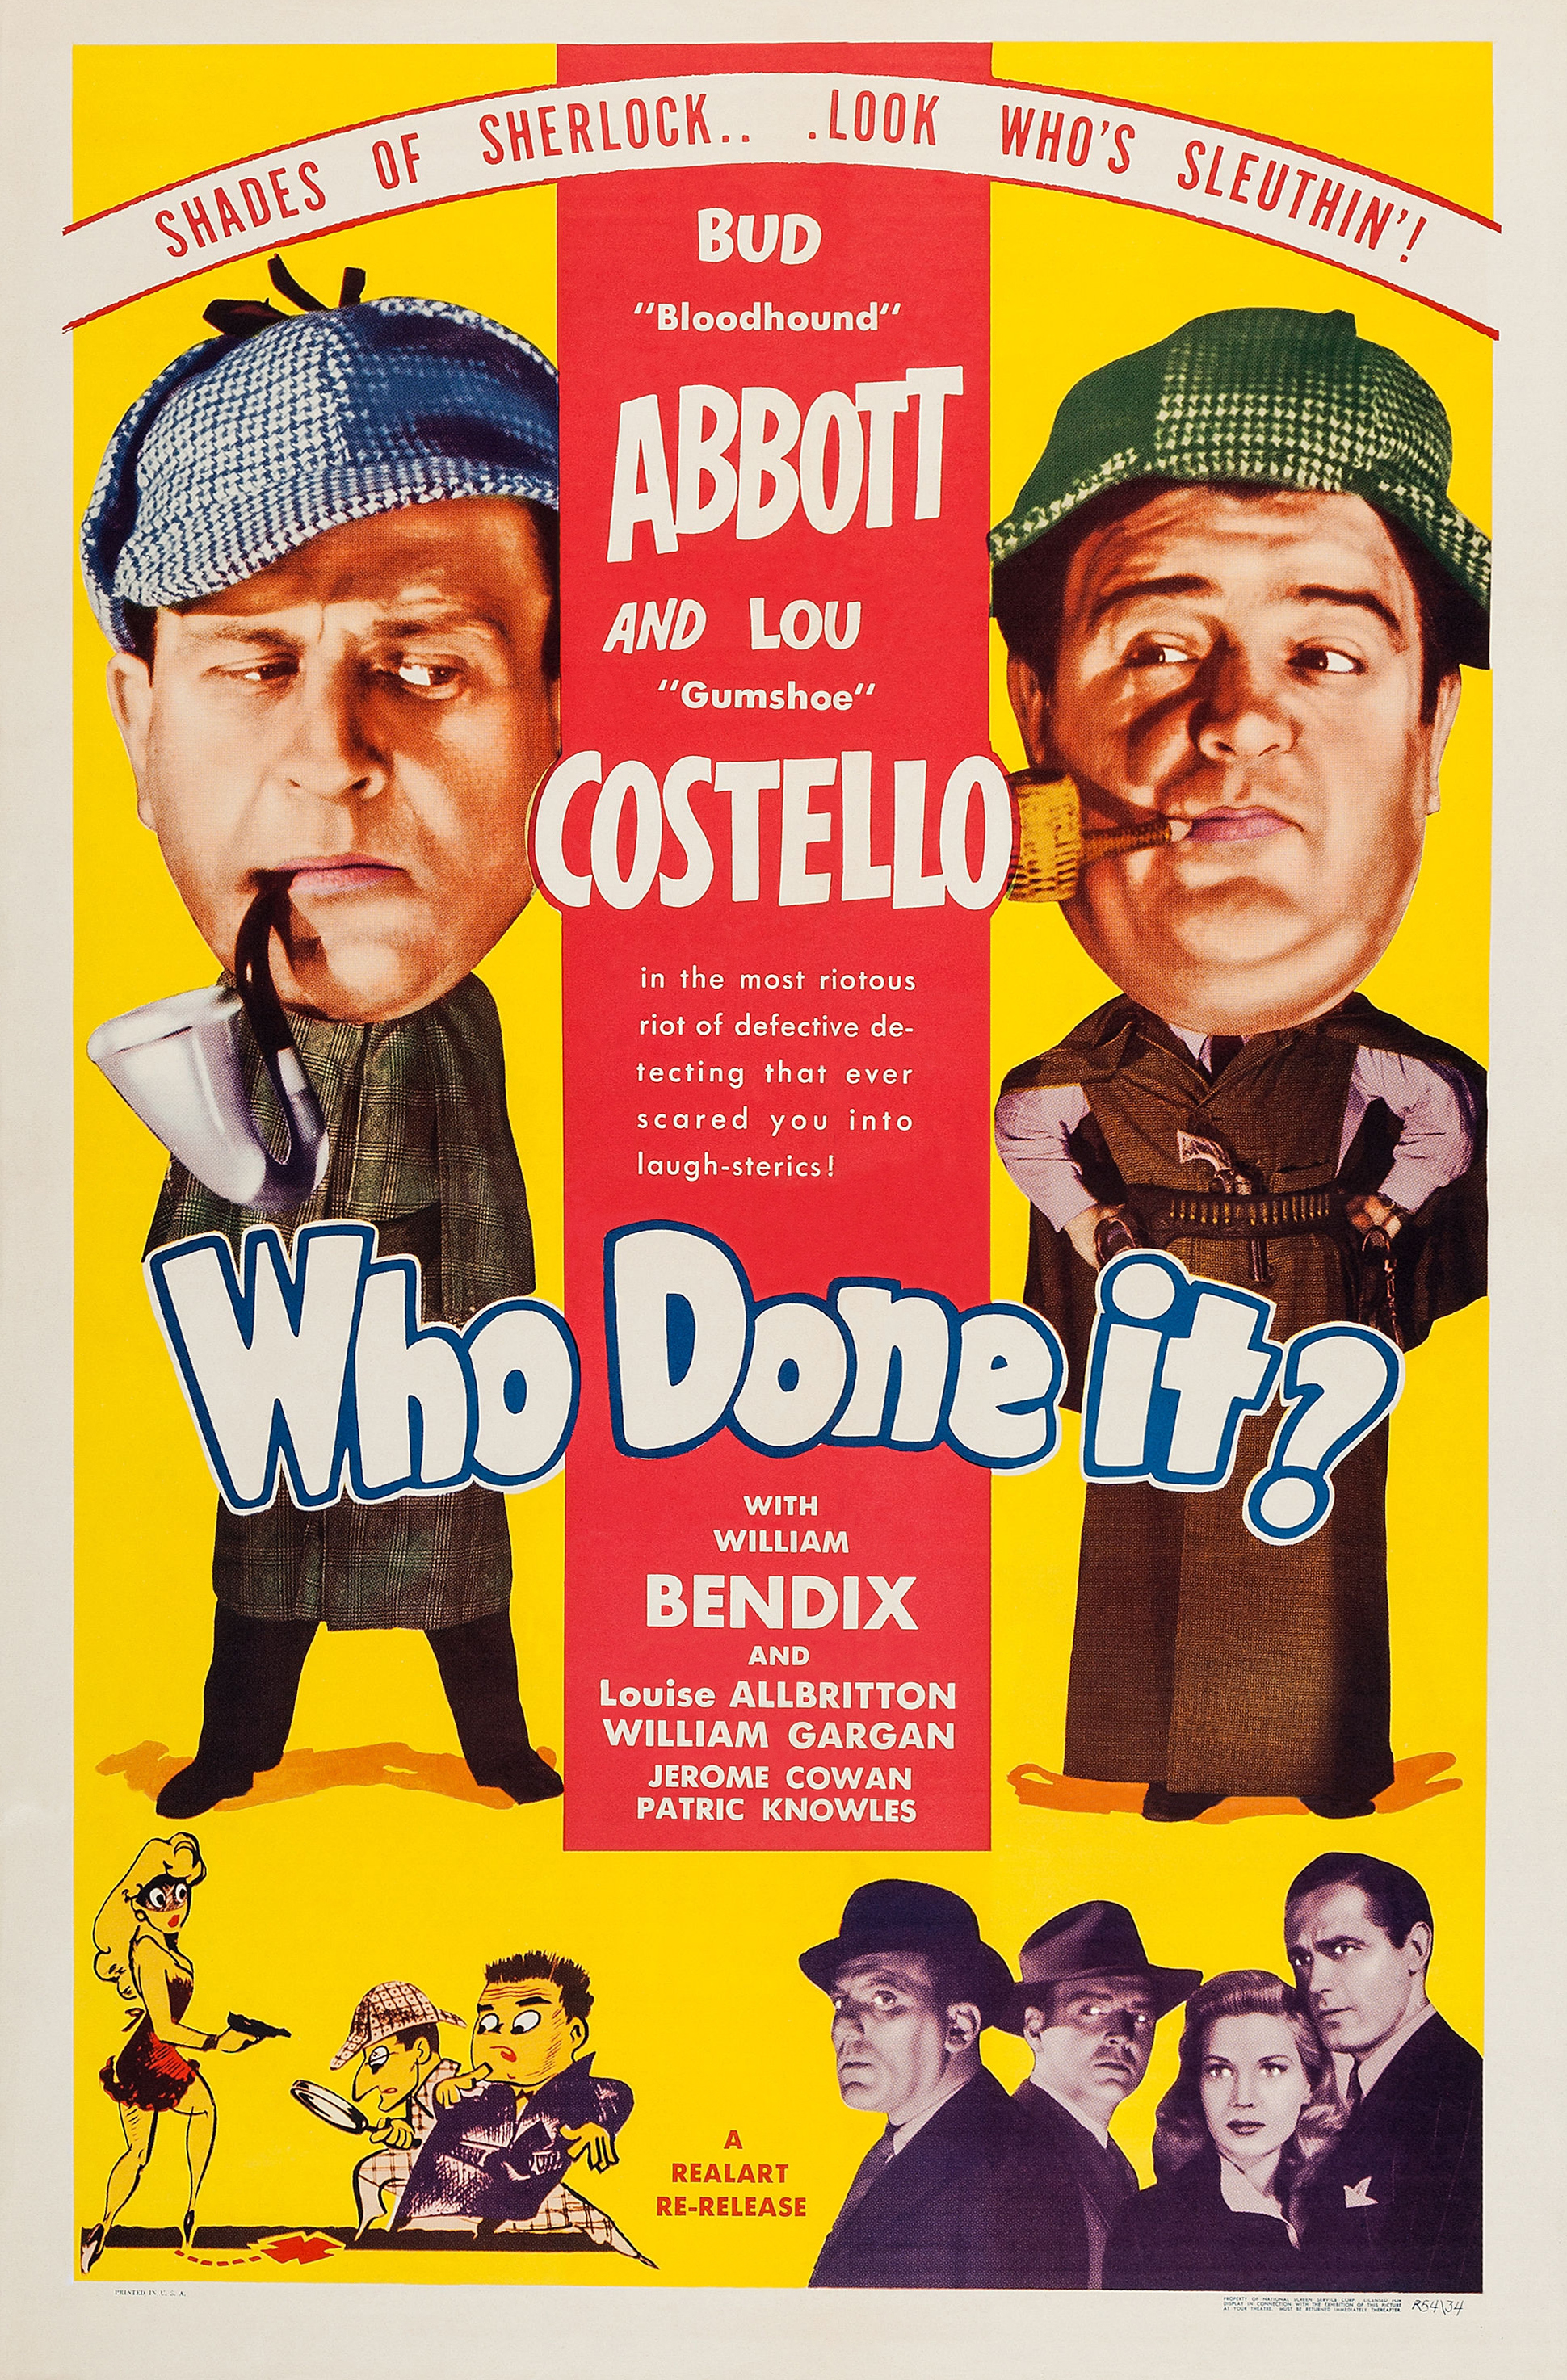 Abbott y Costello: ¿Quién mató a quién?